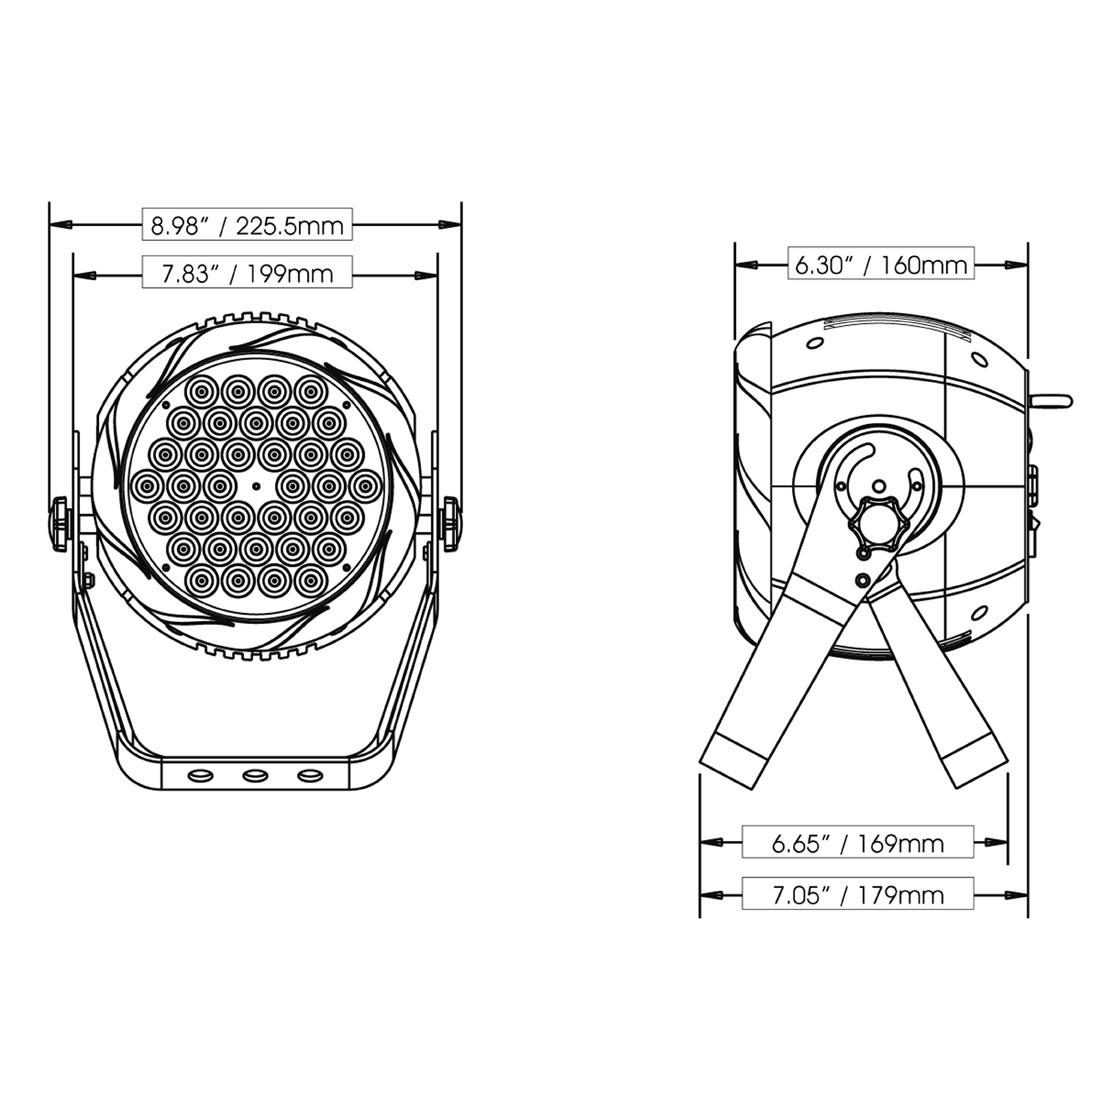 Design Led 36 Rgb